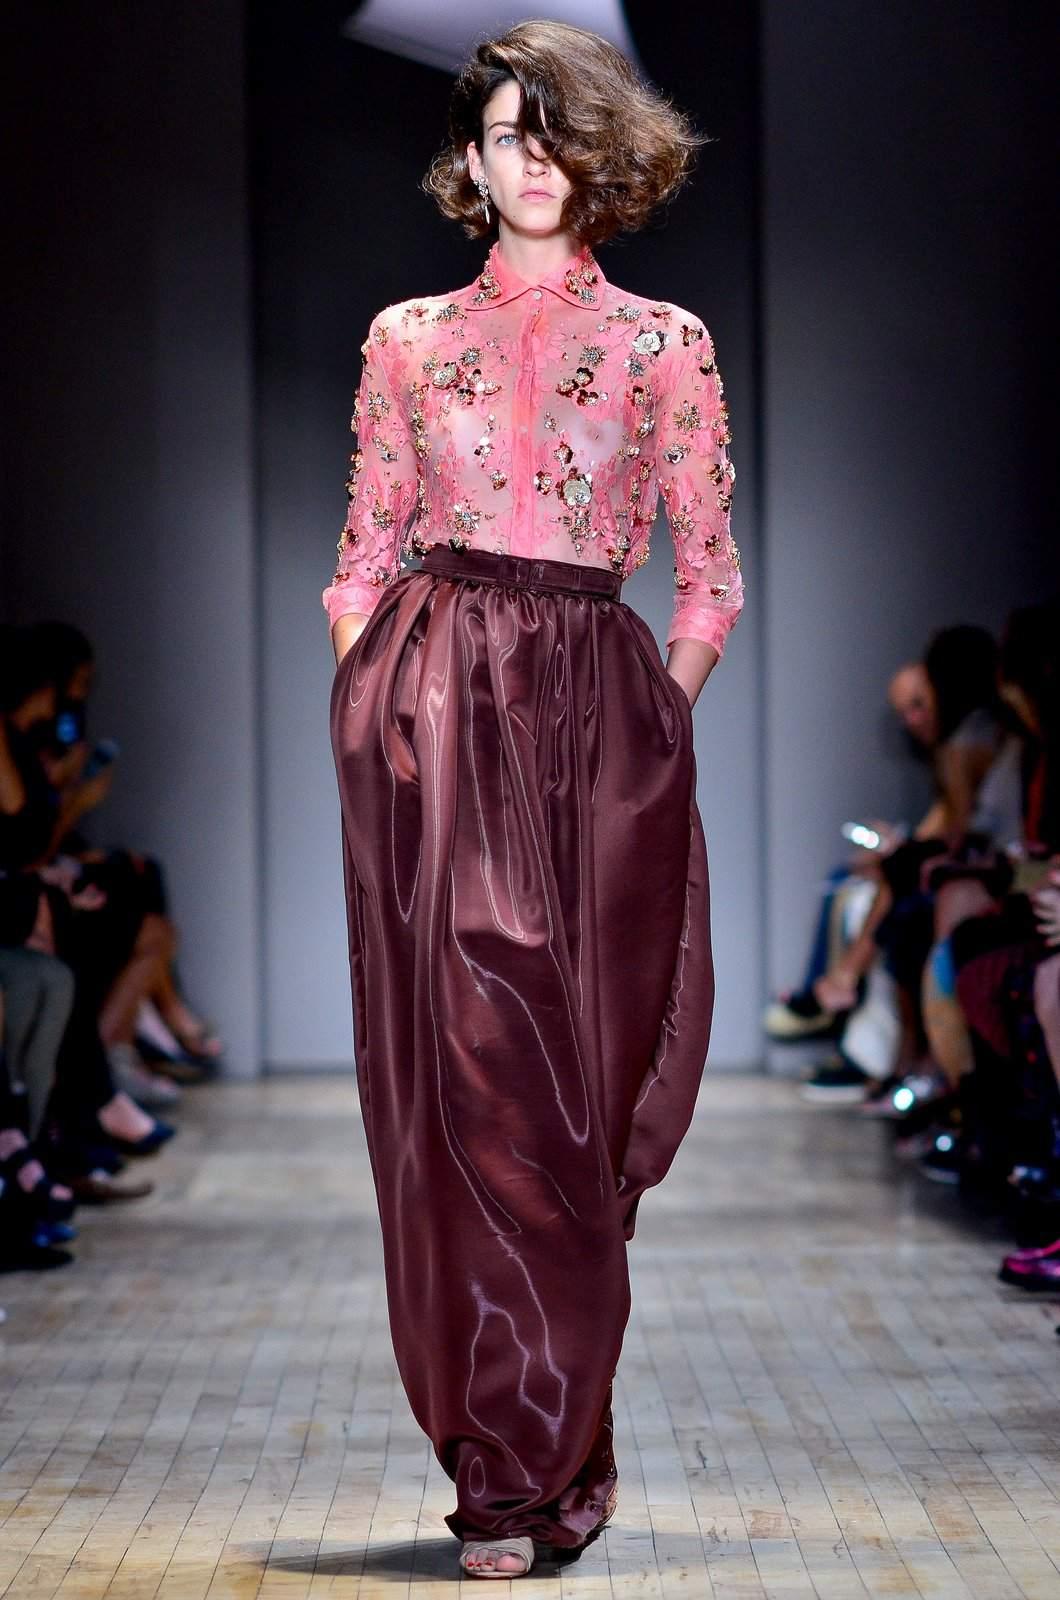 jenny packham12 Jenny Packham Spring/Summer Collection 2015 at NYC Fashion Week